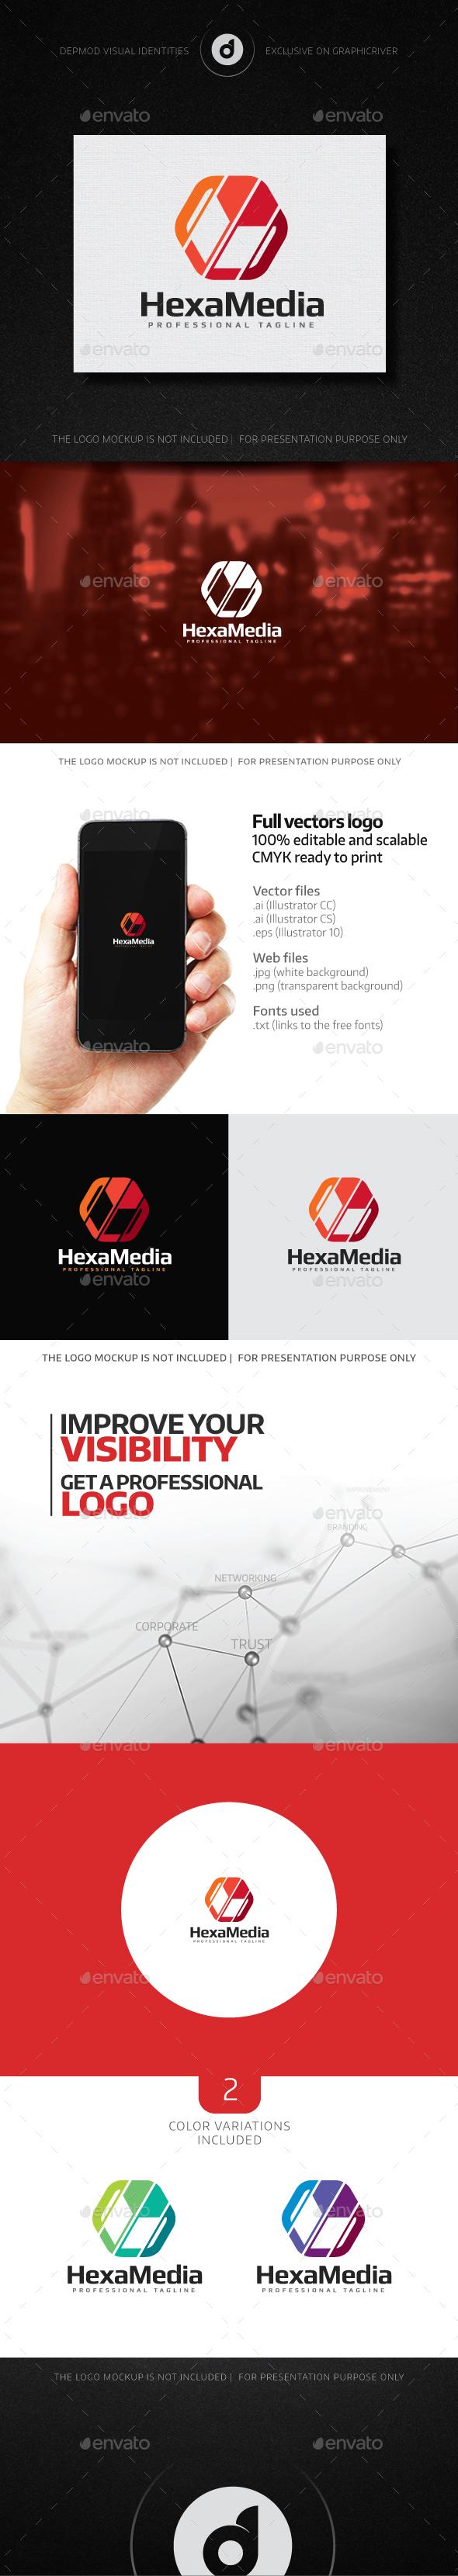 HexaMedia Logo - Abstract Logo Templates